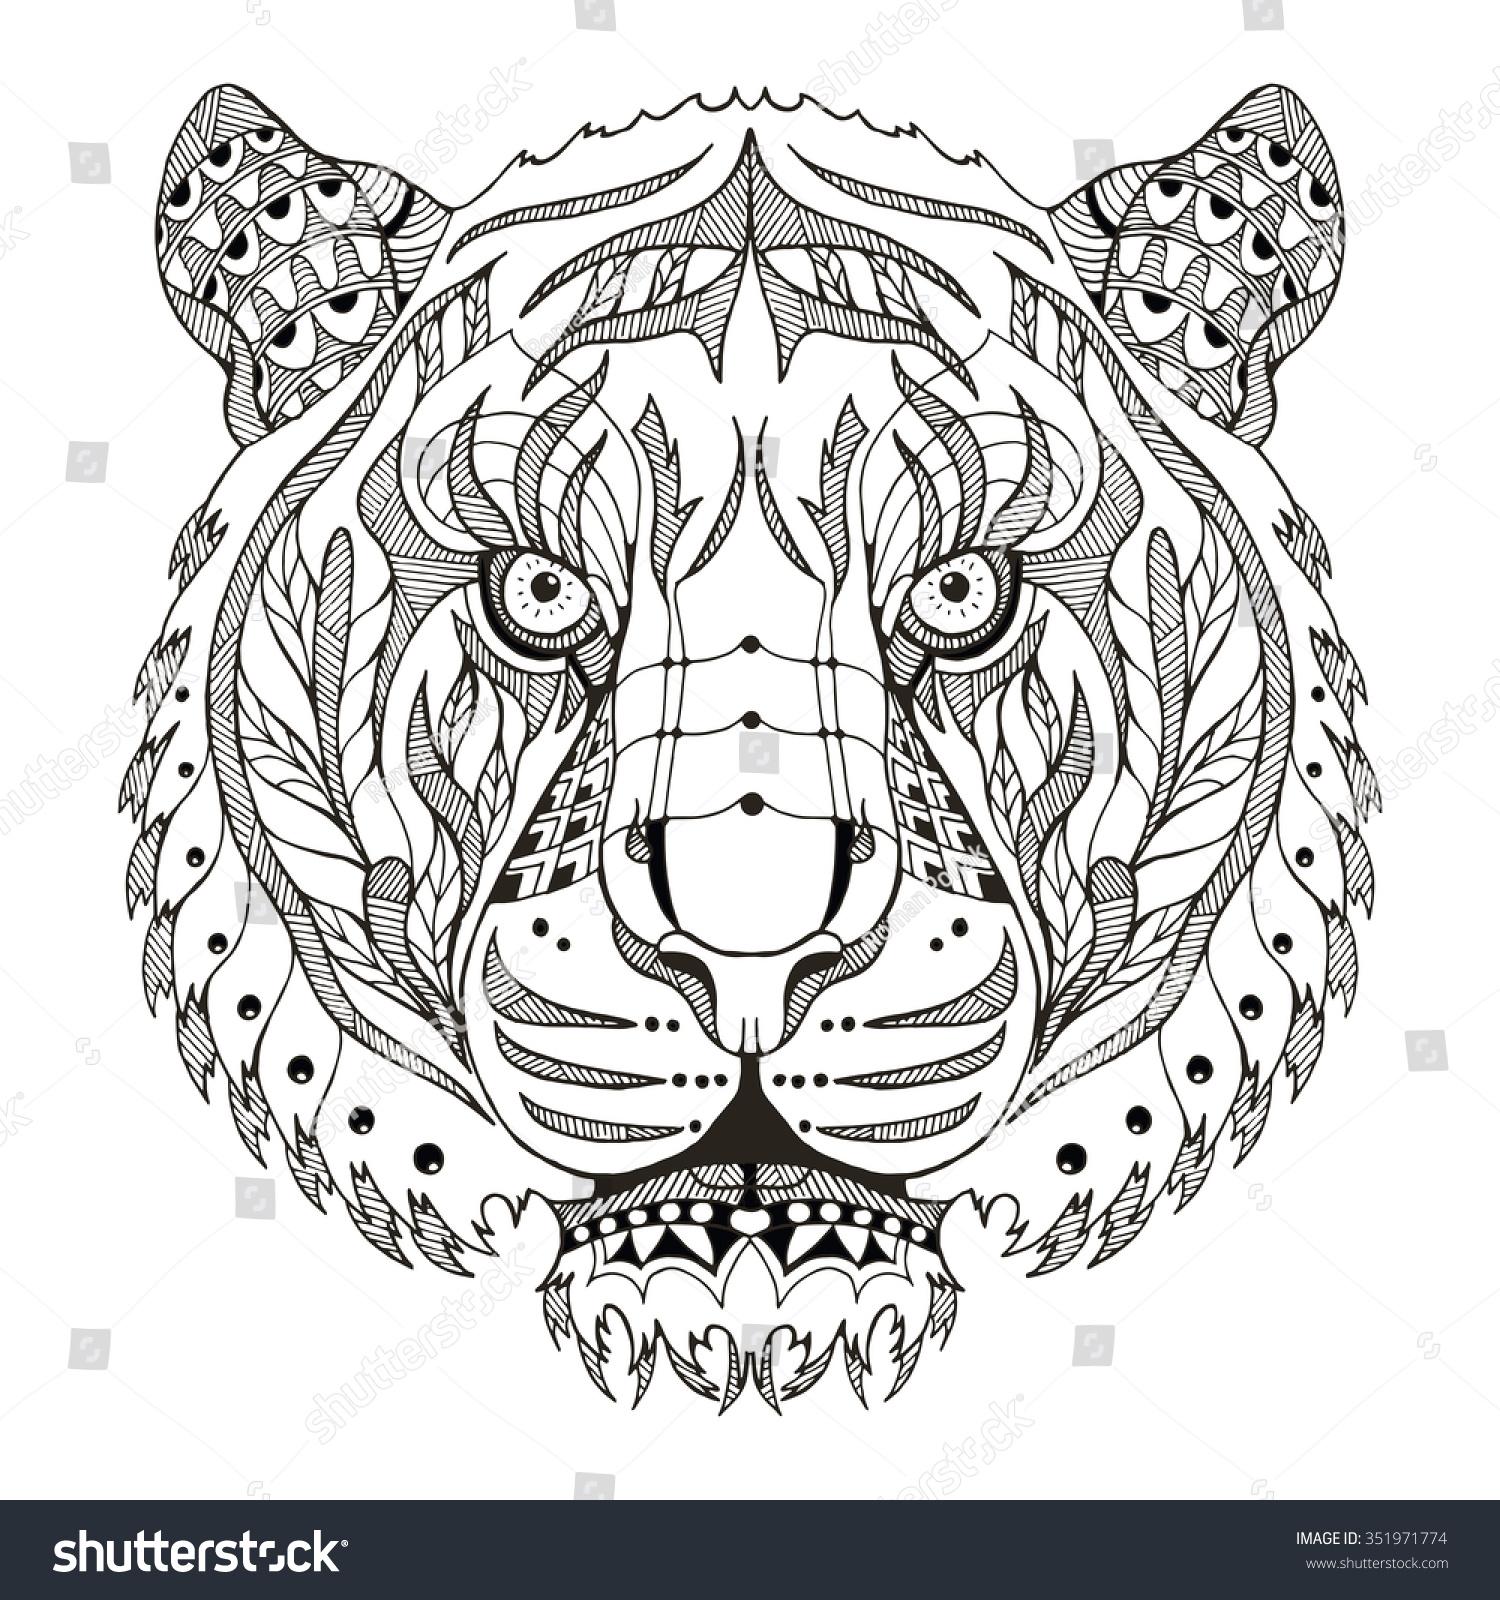 tiger zentangle stylized vector illustration stock